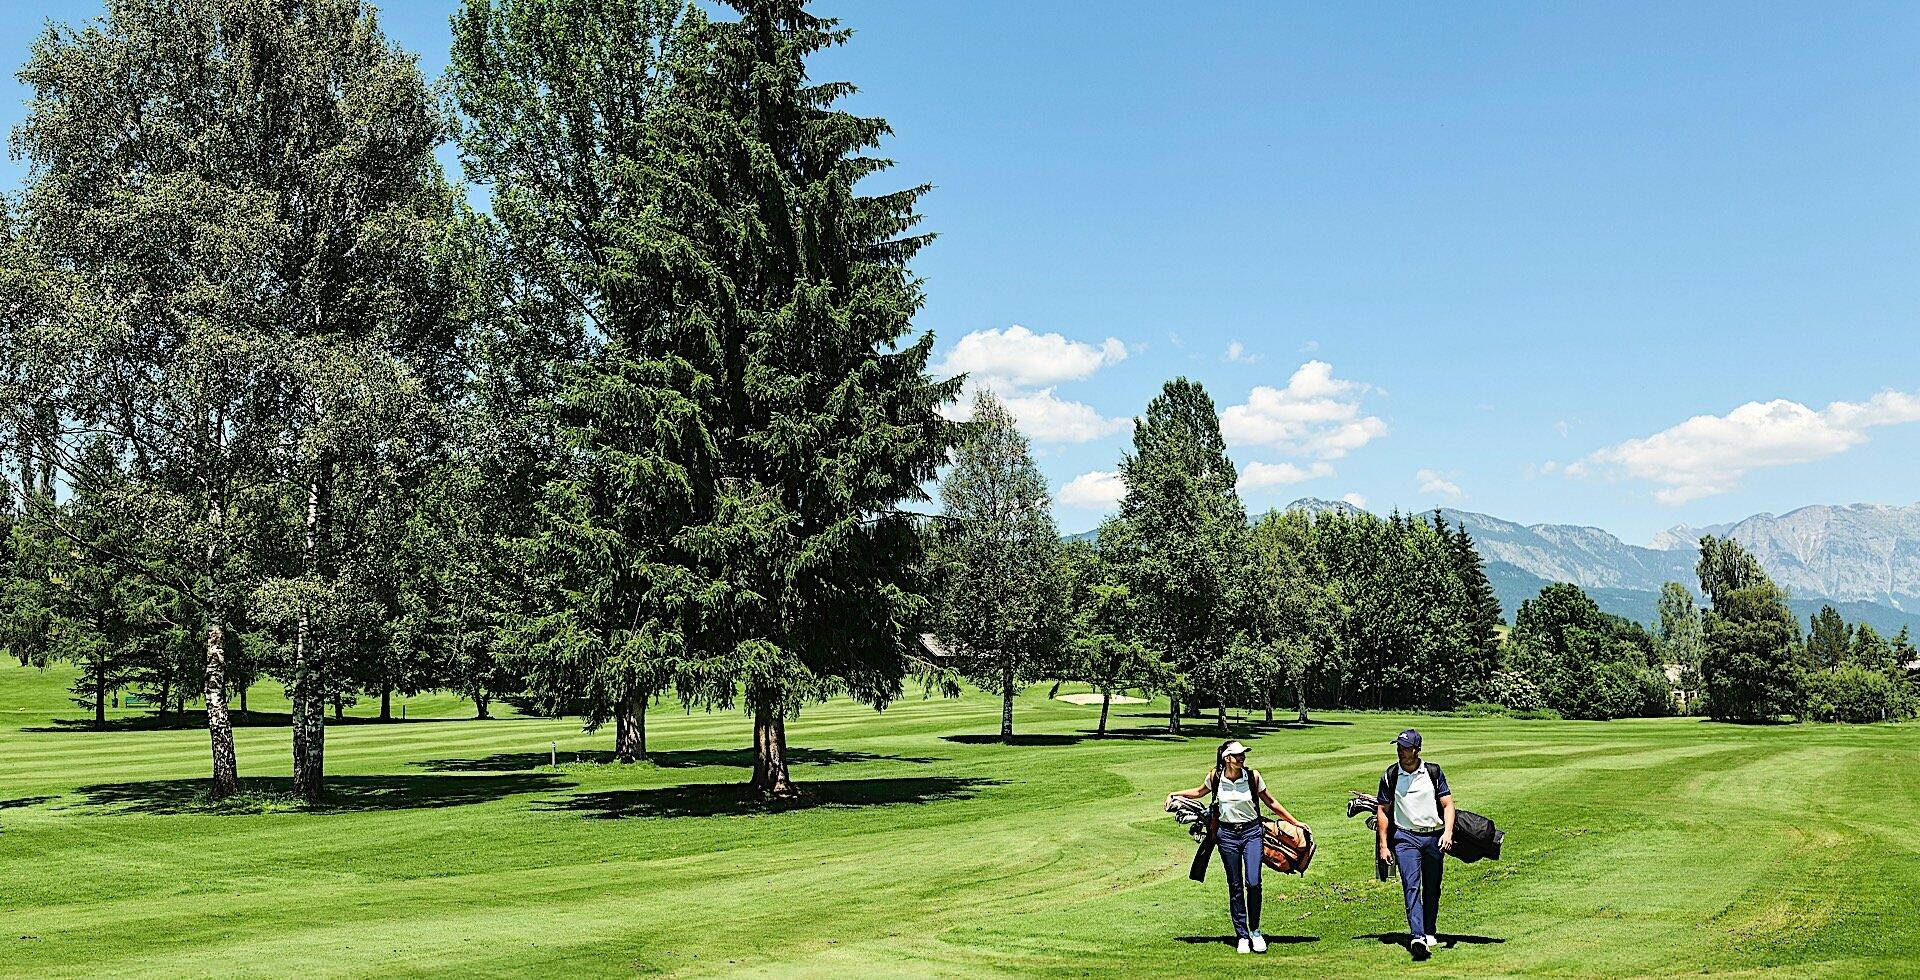 Golf Course at Romantik Hotel Schloss Pichlarn